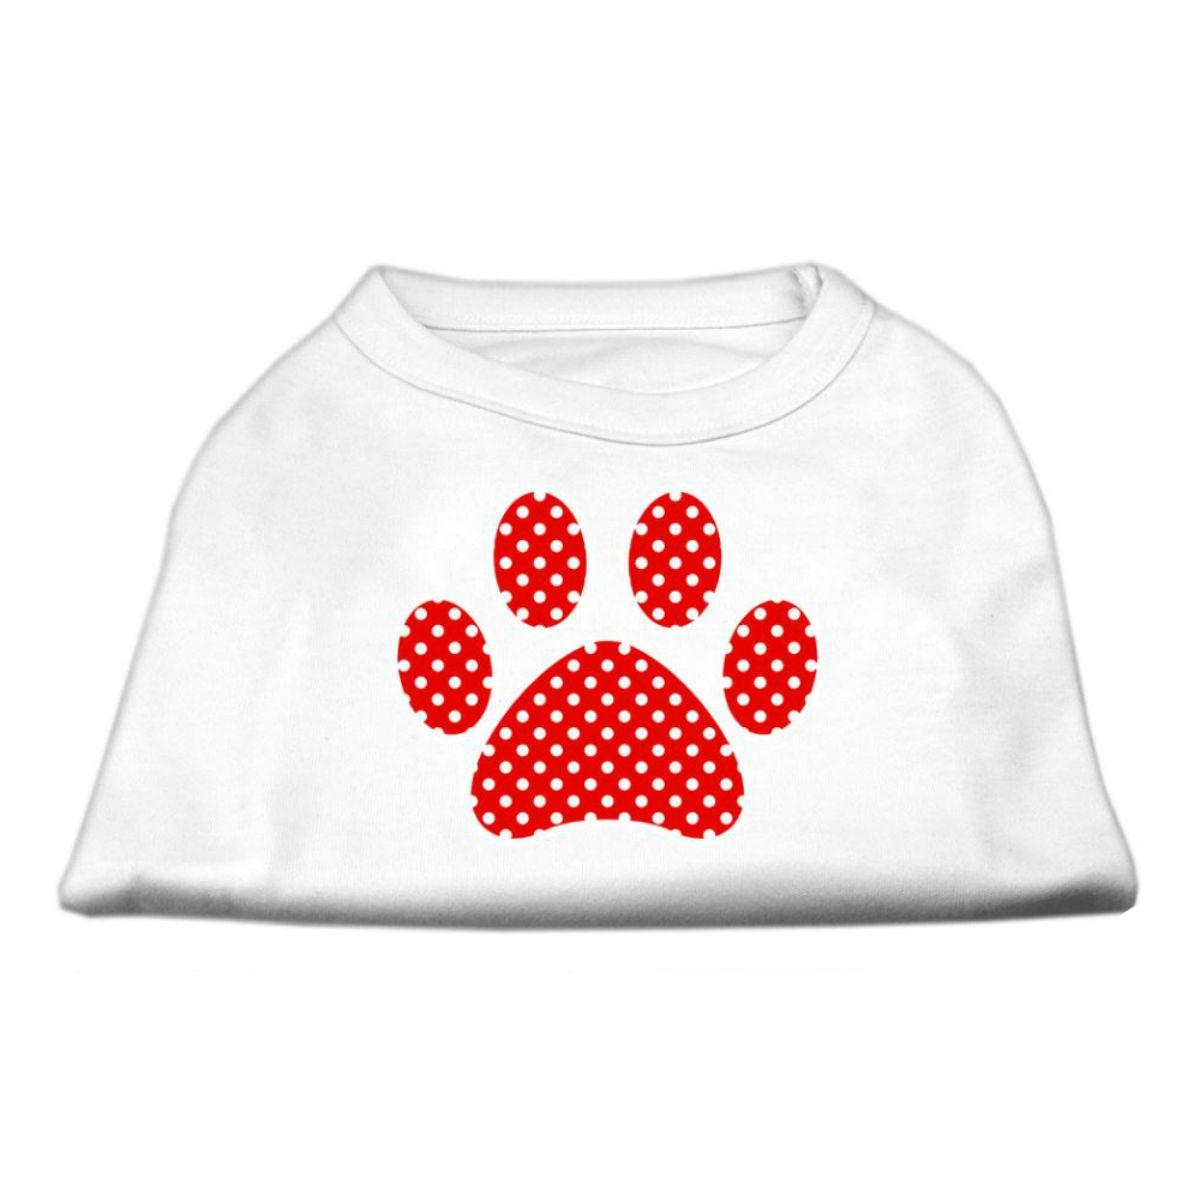 Red Swiss Dot Paw Dog Shirt - White